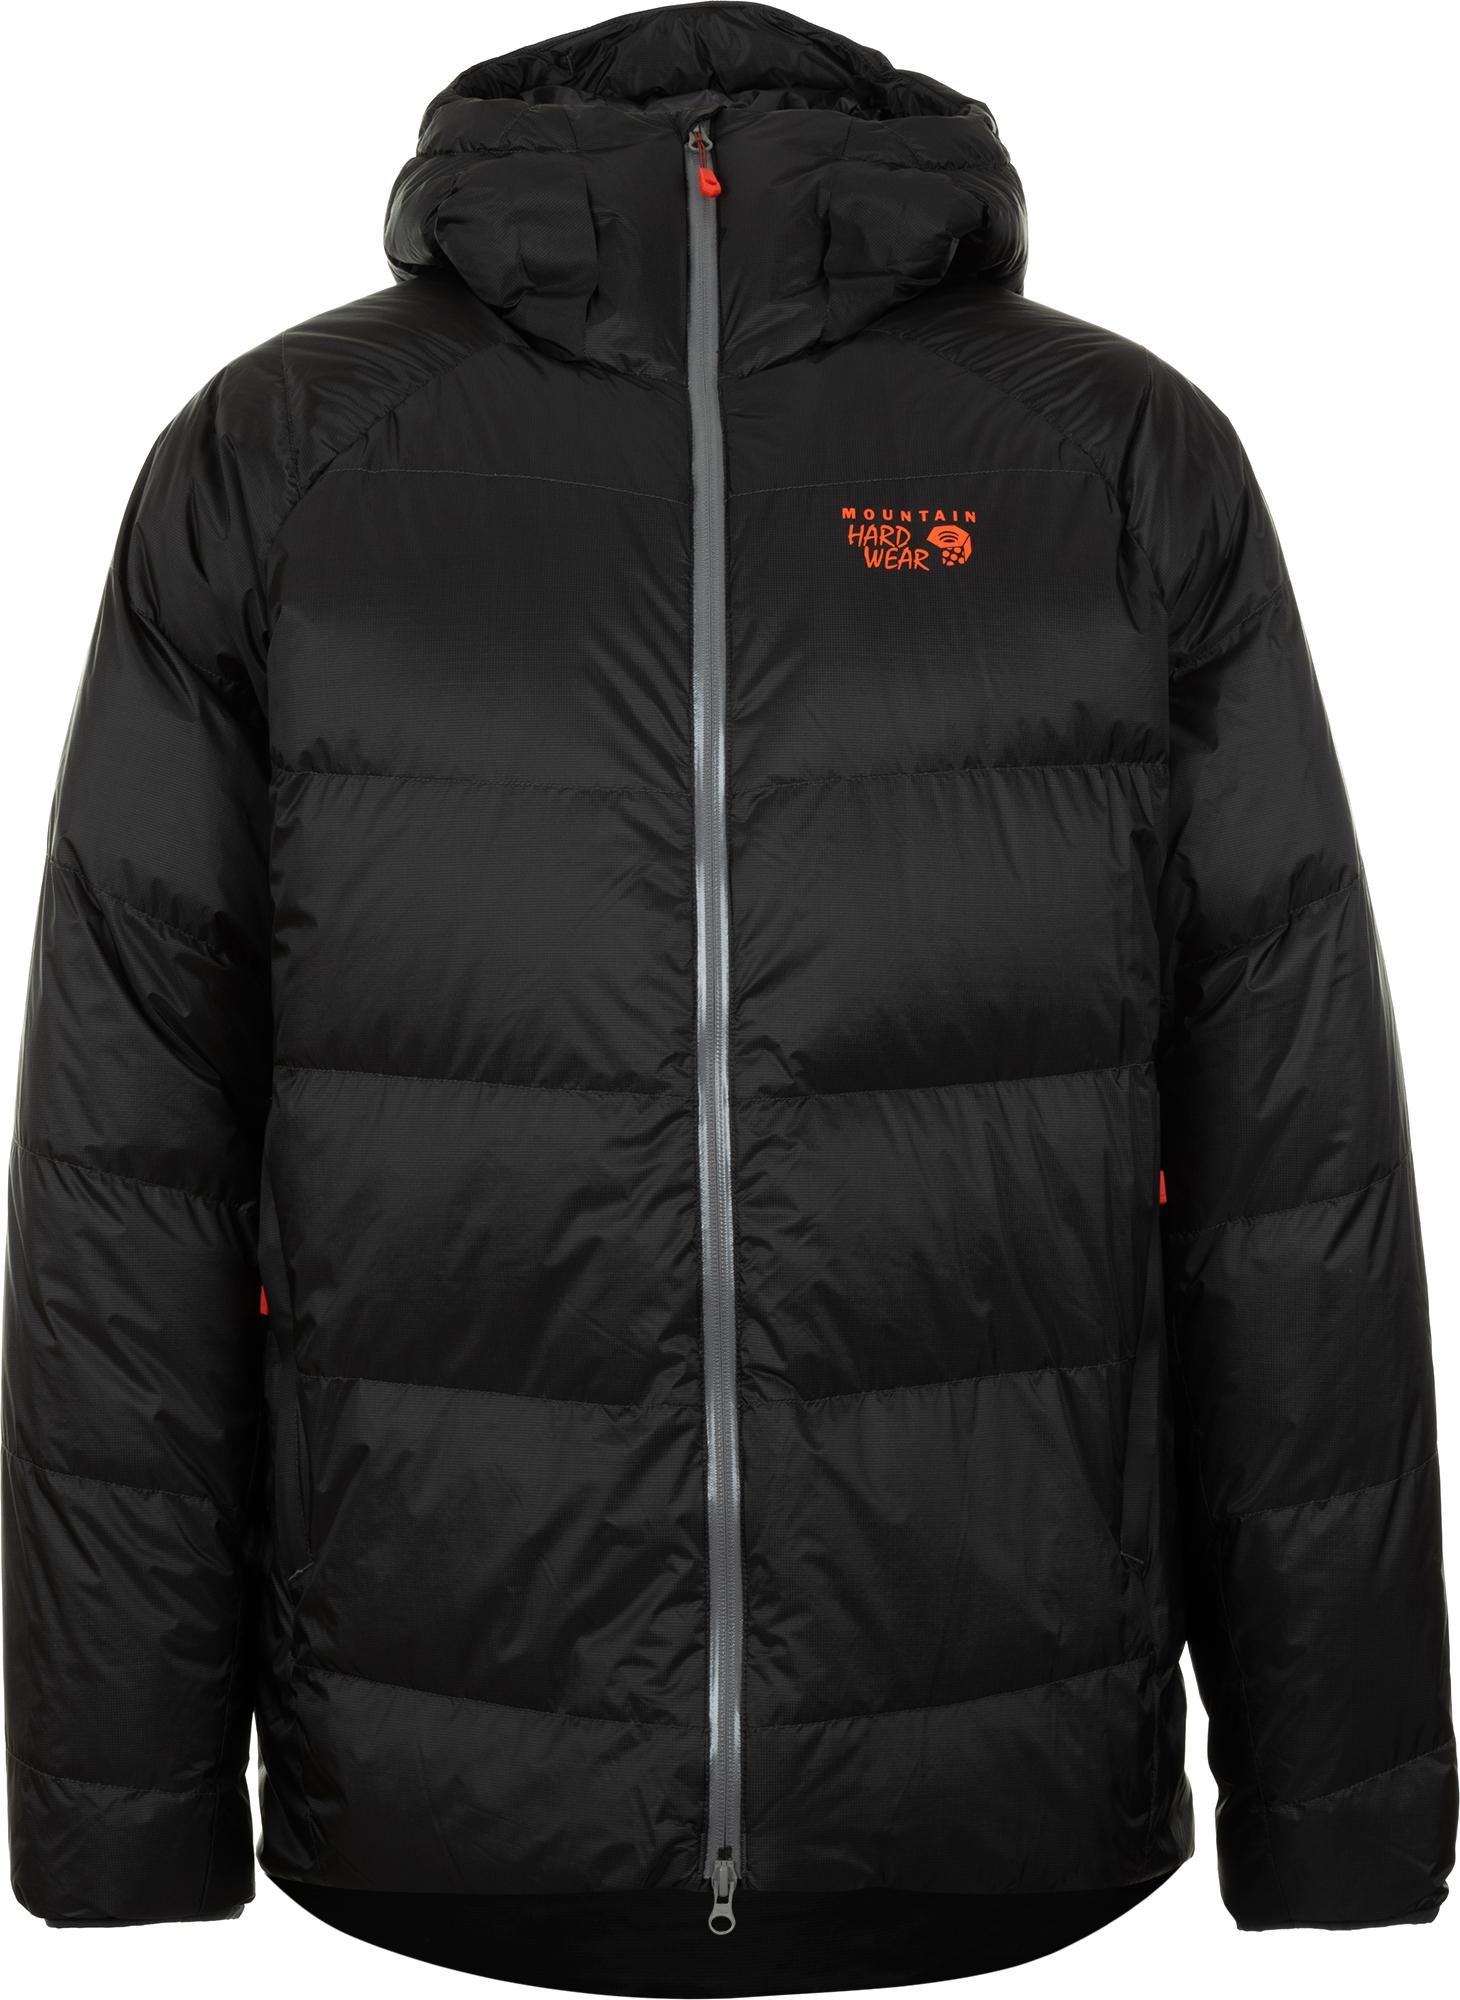 Mountain Hardwear Куртка пуховая мужская Mountain Hardwear Nilas, размер 52 цена